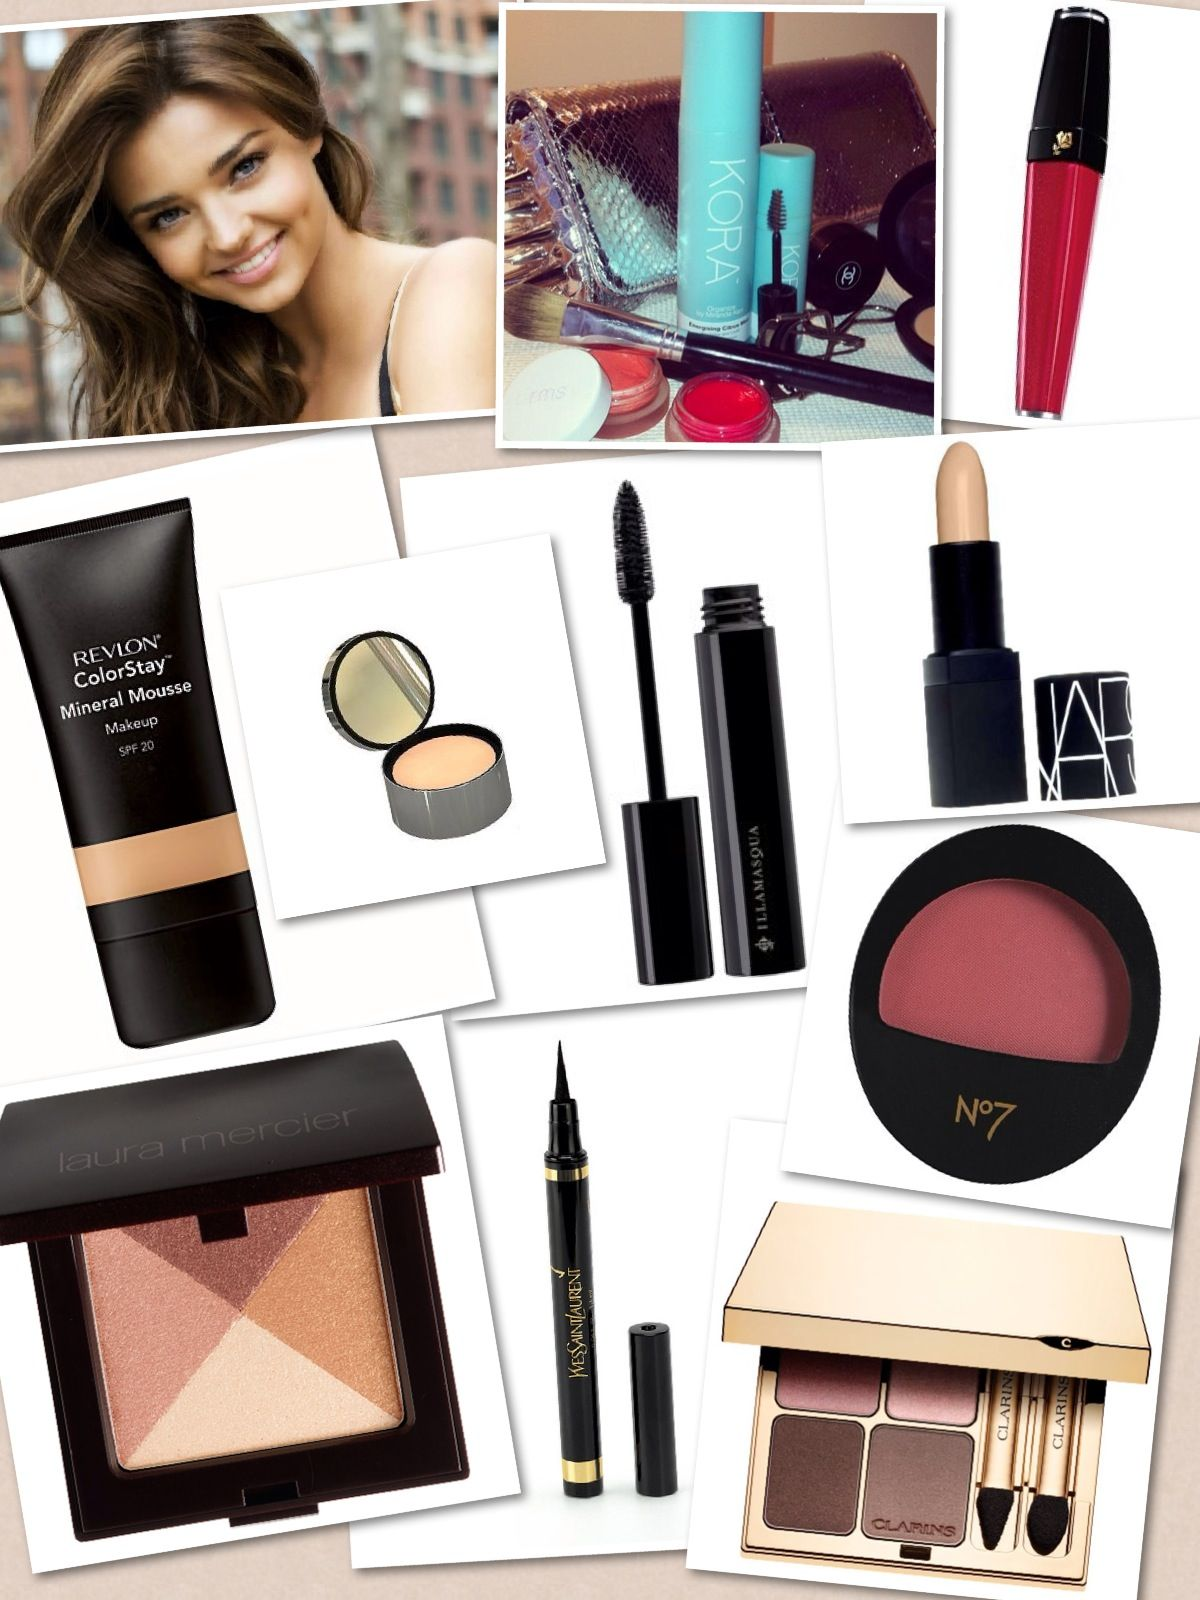 34ed5b7a29224e Inside Miranda Kerr's Makeup Bag - Yves Saint Laurent The Black Collection  Eyeliner Pen, Clarins